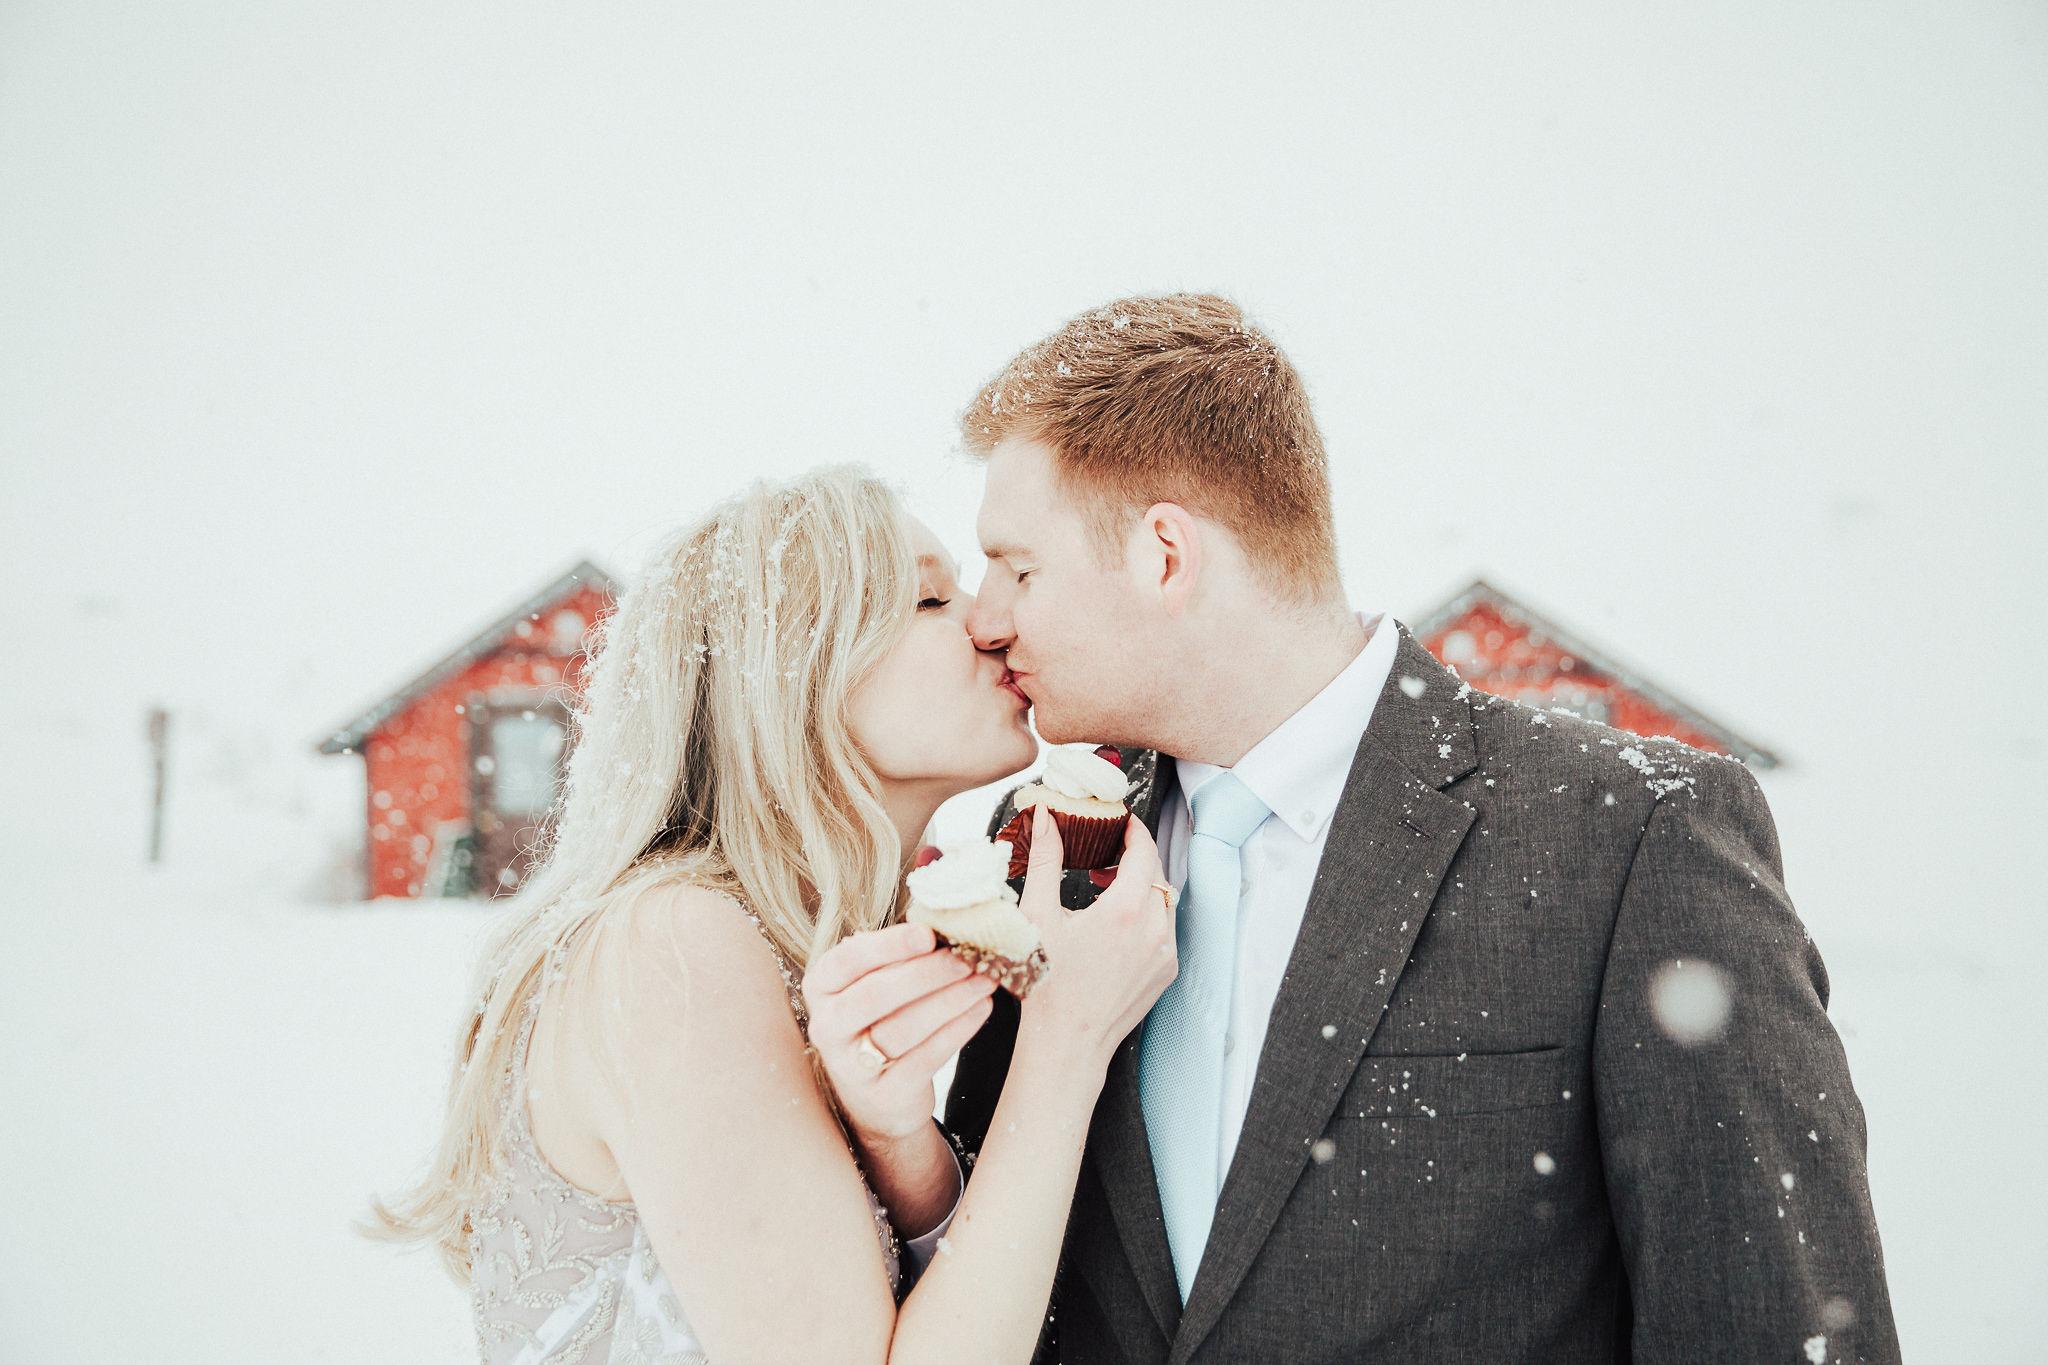 Winter Wedding Cake Smash